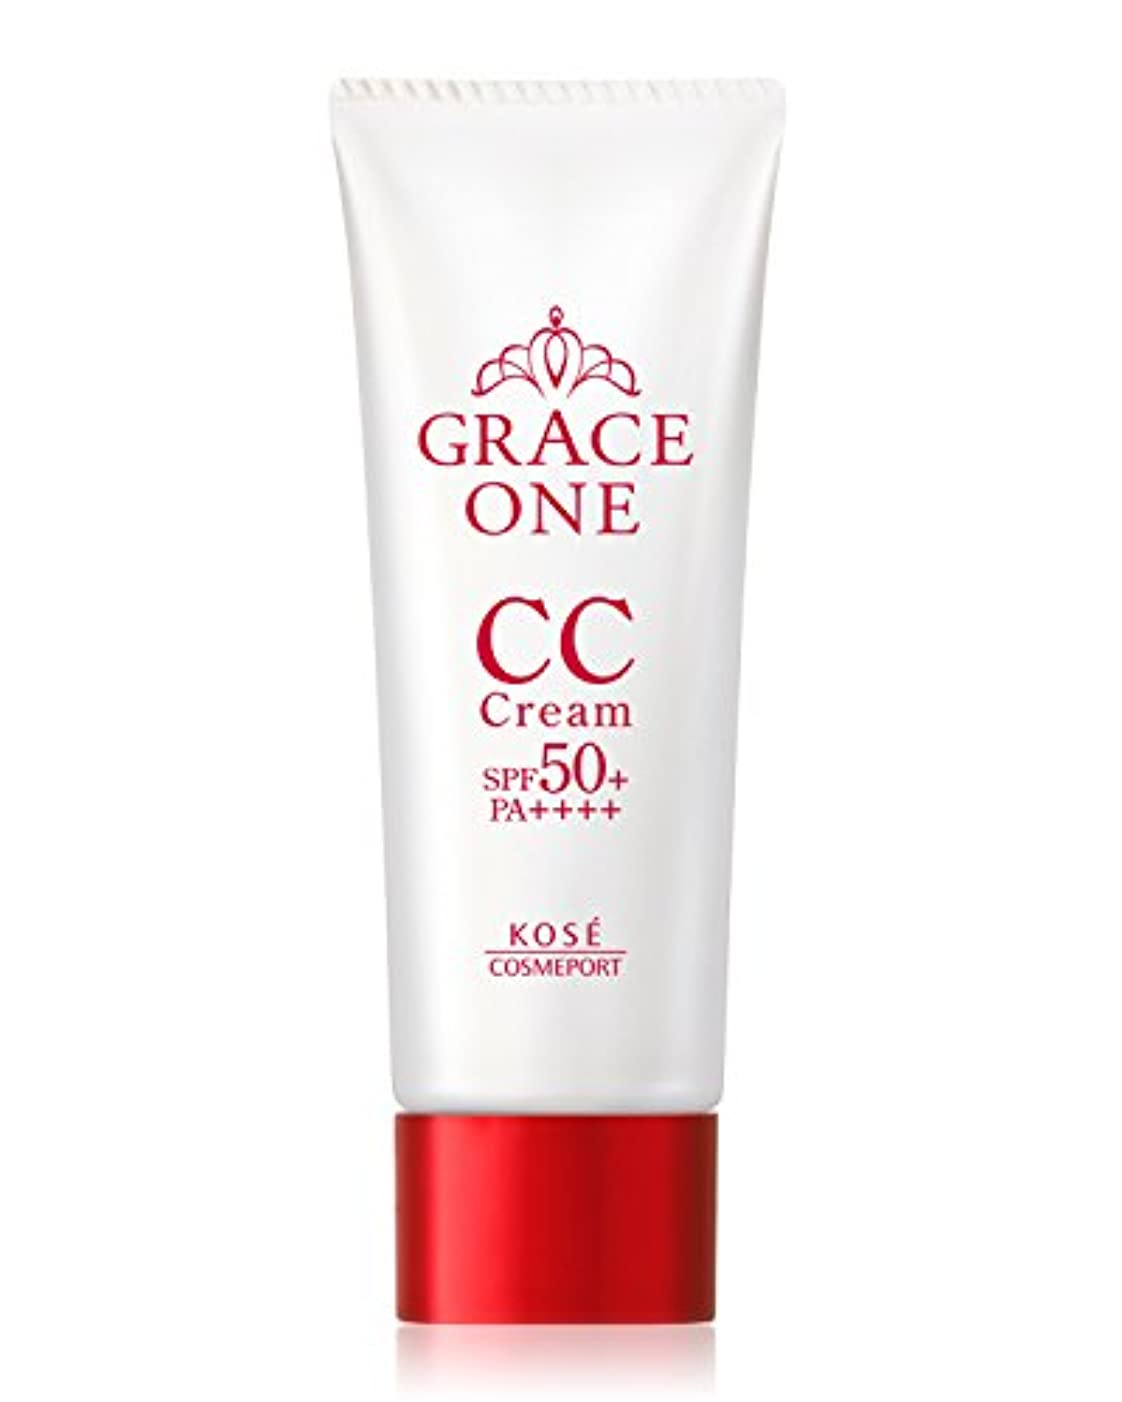 KOSE グレイス ワン CCクリームUV 01 (自然な肌色) 50g